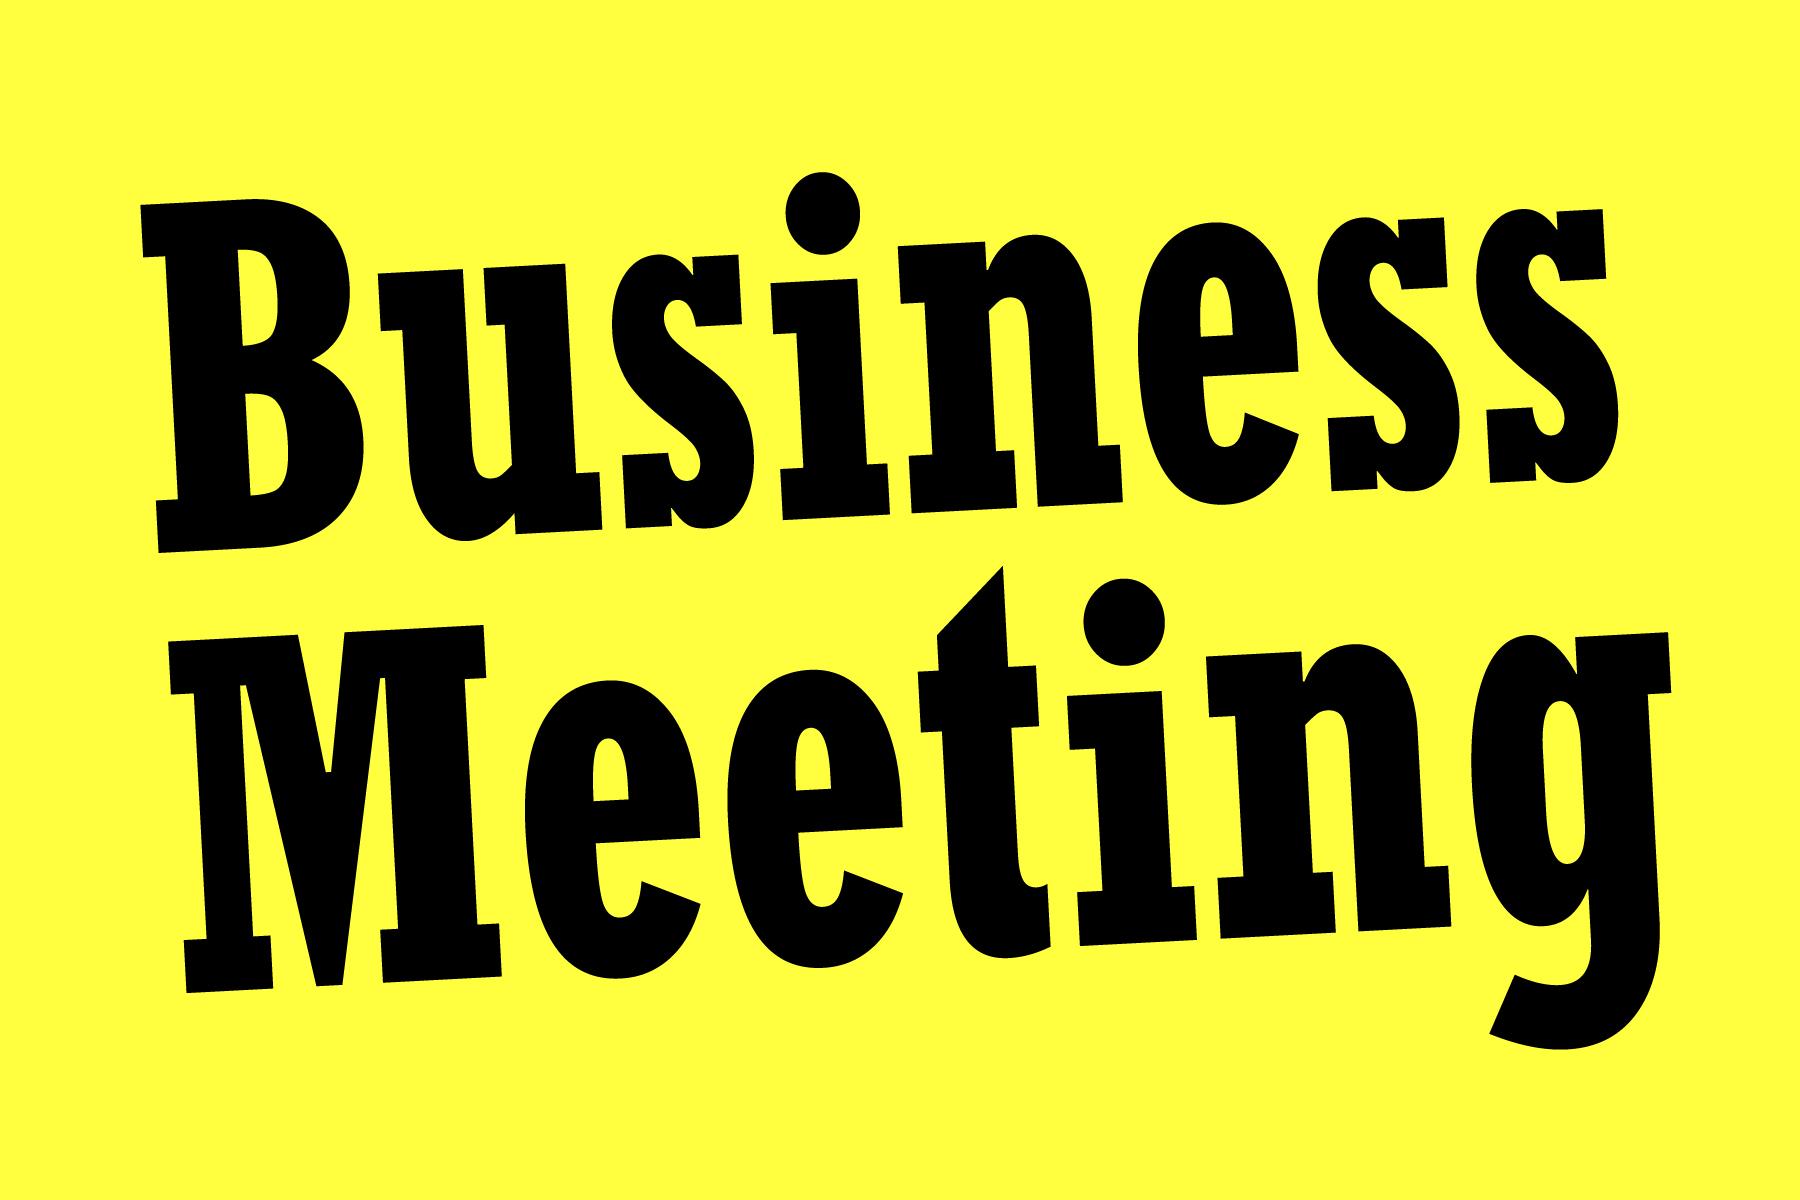 1800x1200 Church Business Meeting Clipart